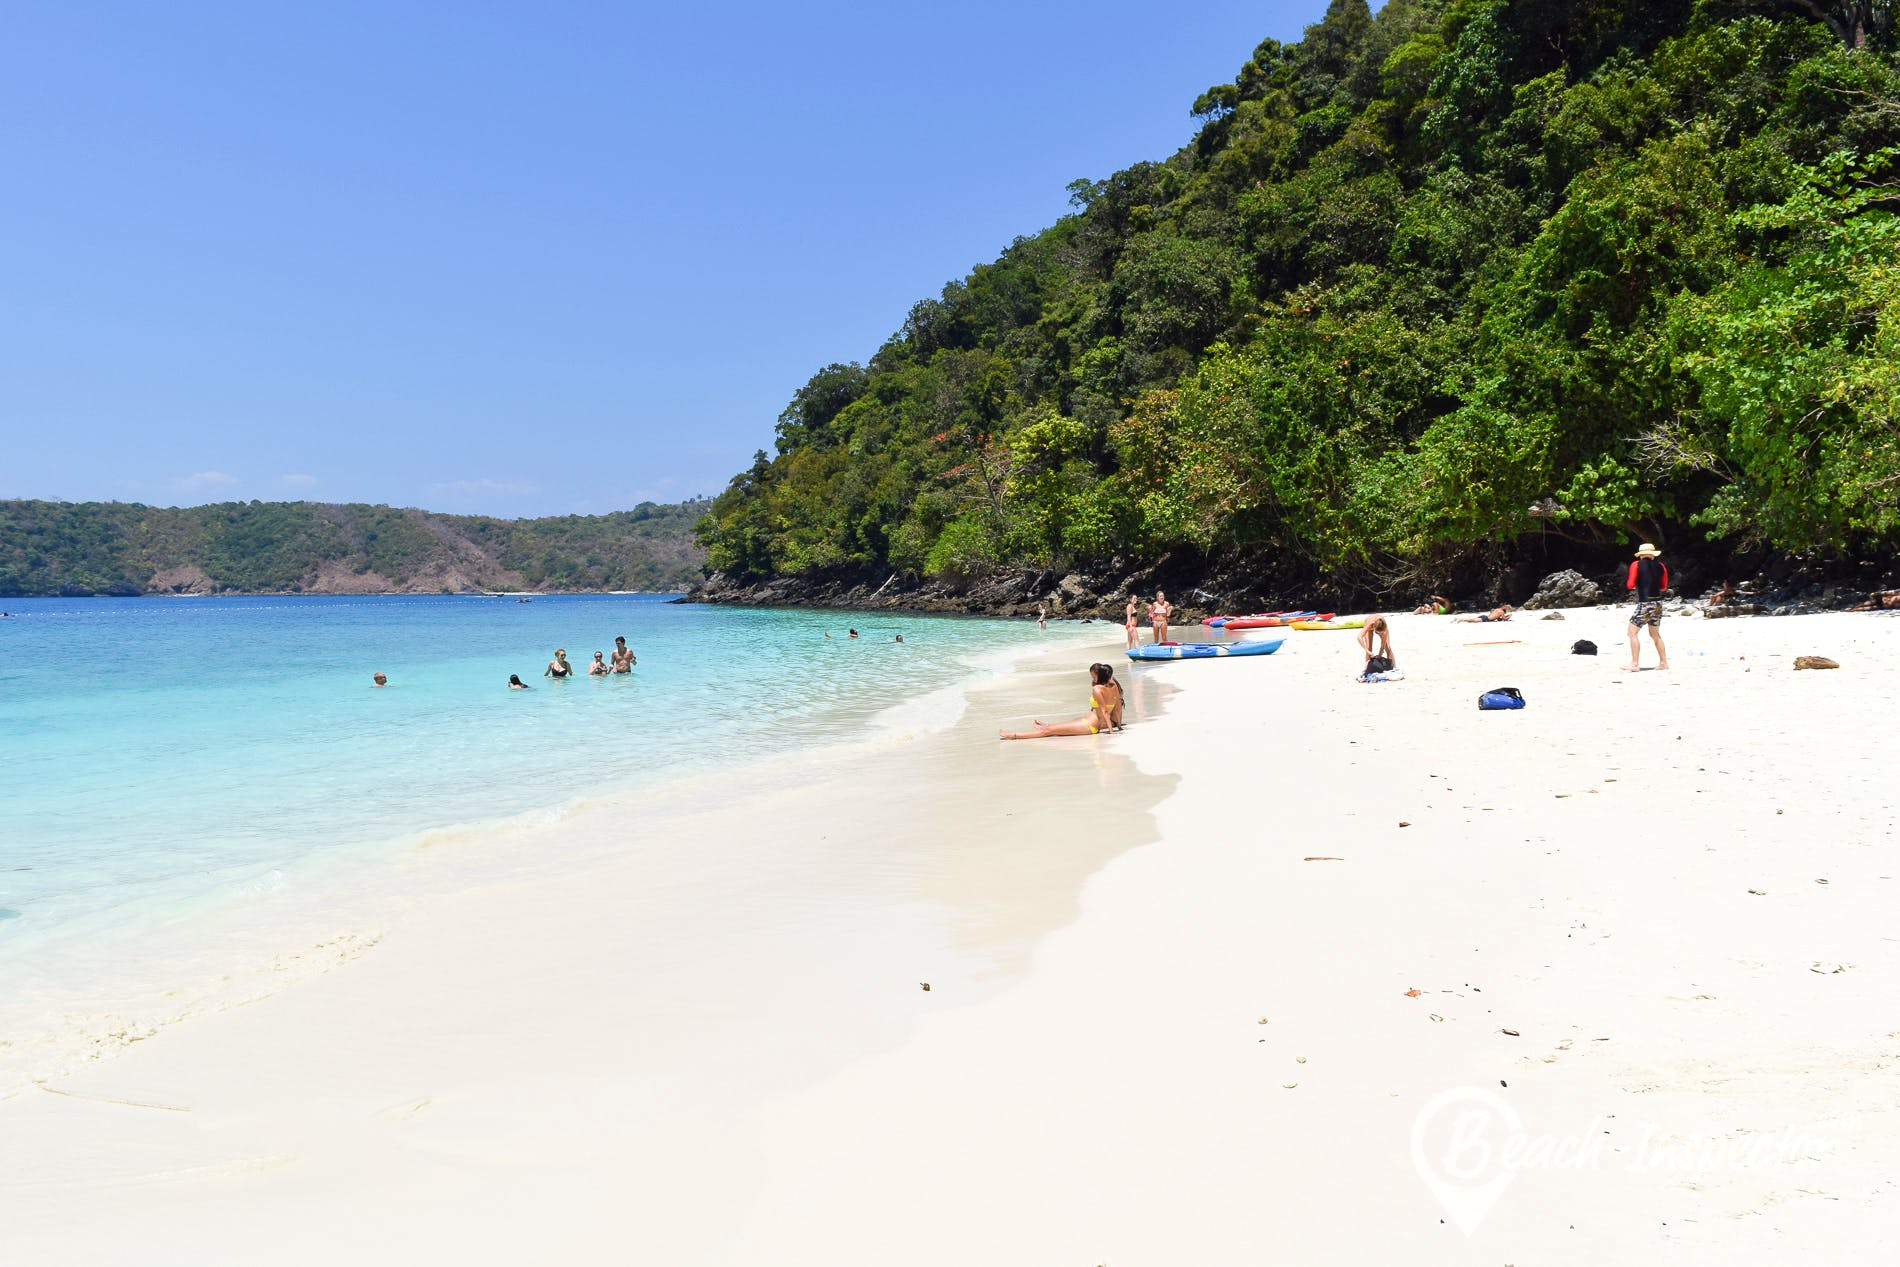 Strand Monkey Beach, Koh Phi Phi, Thailand